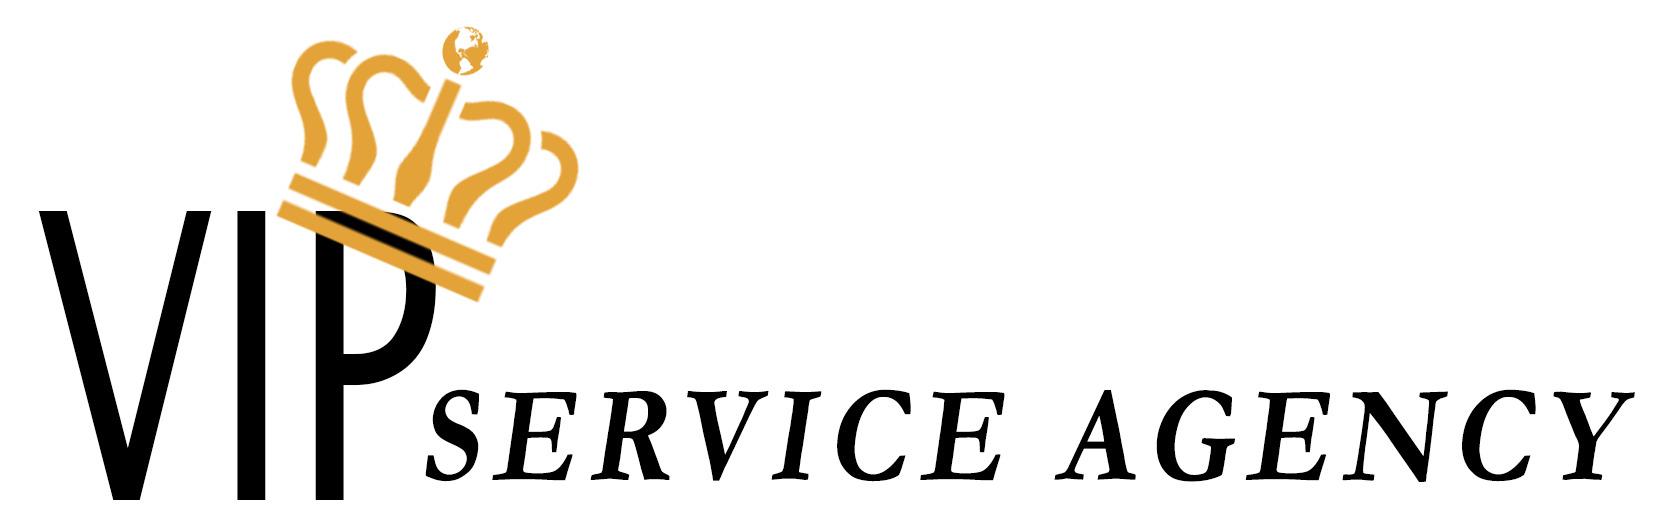 VIP SERVICE AGENCY™ Worldwide